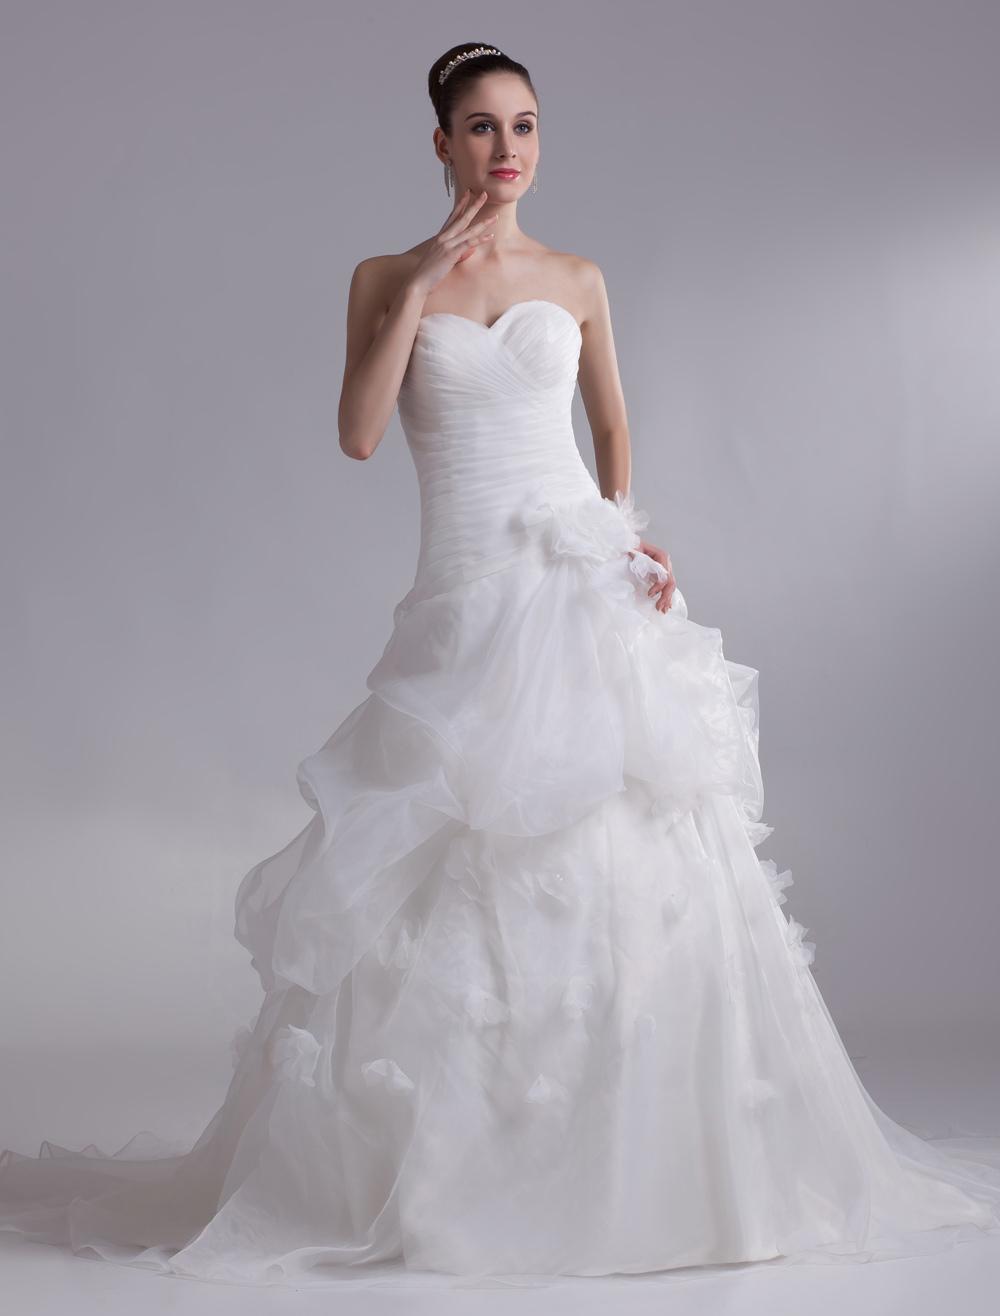 Ivory Sweetheart Neck Flower Organza Bride's Wedding Dress